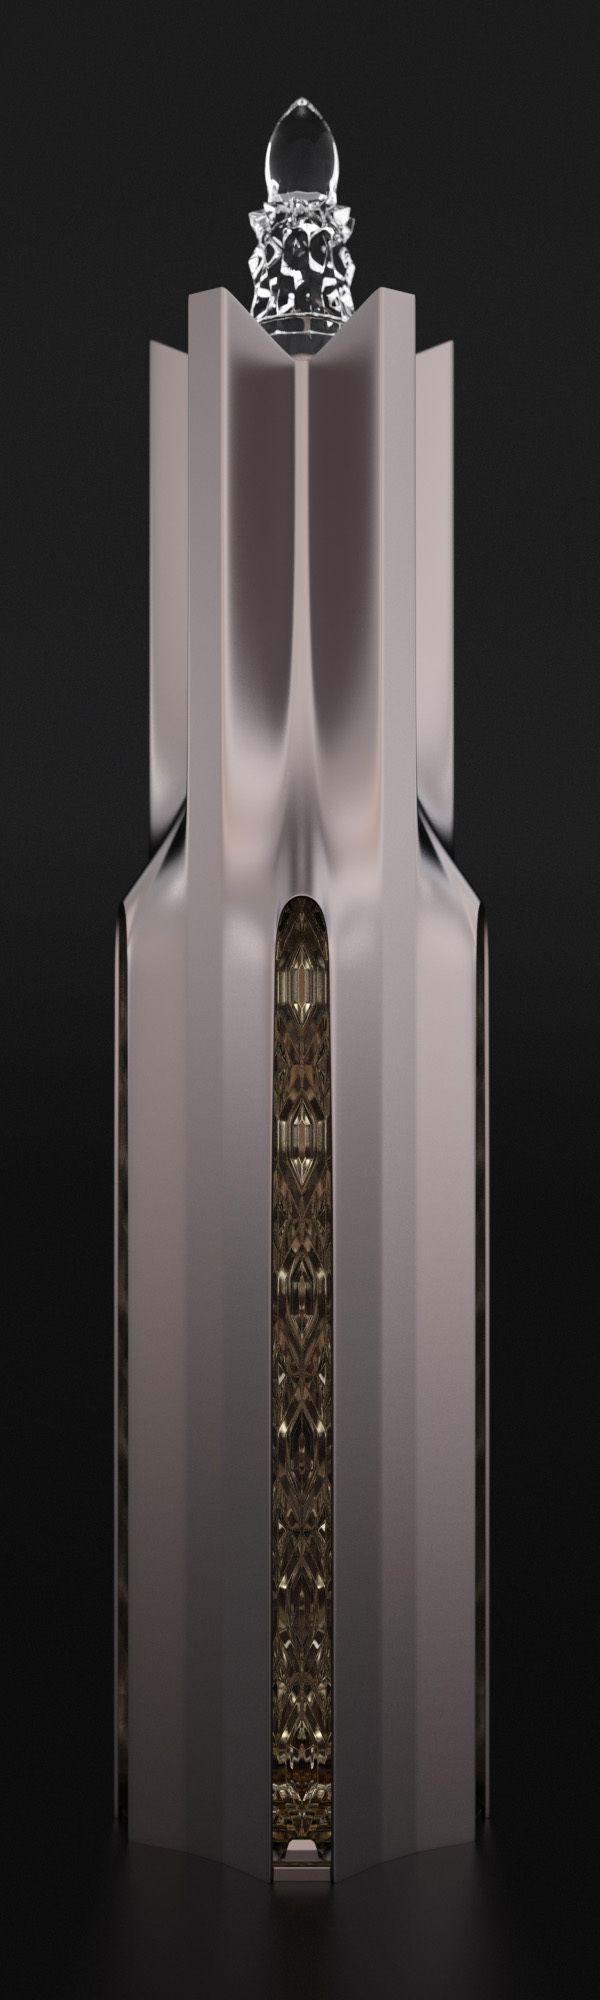 Cathedral cognac bottle by Ivan Venkov, via Behance